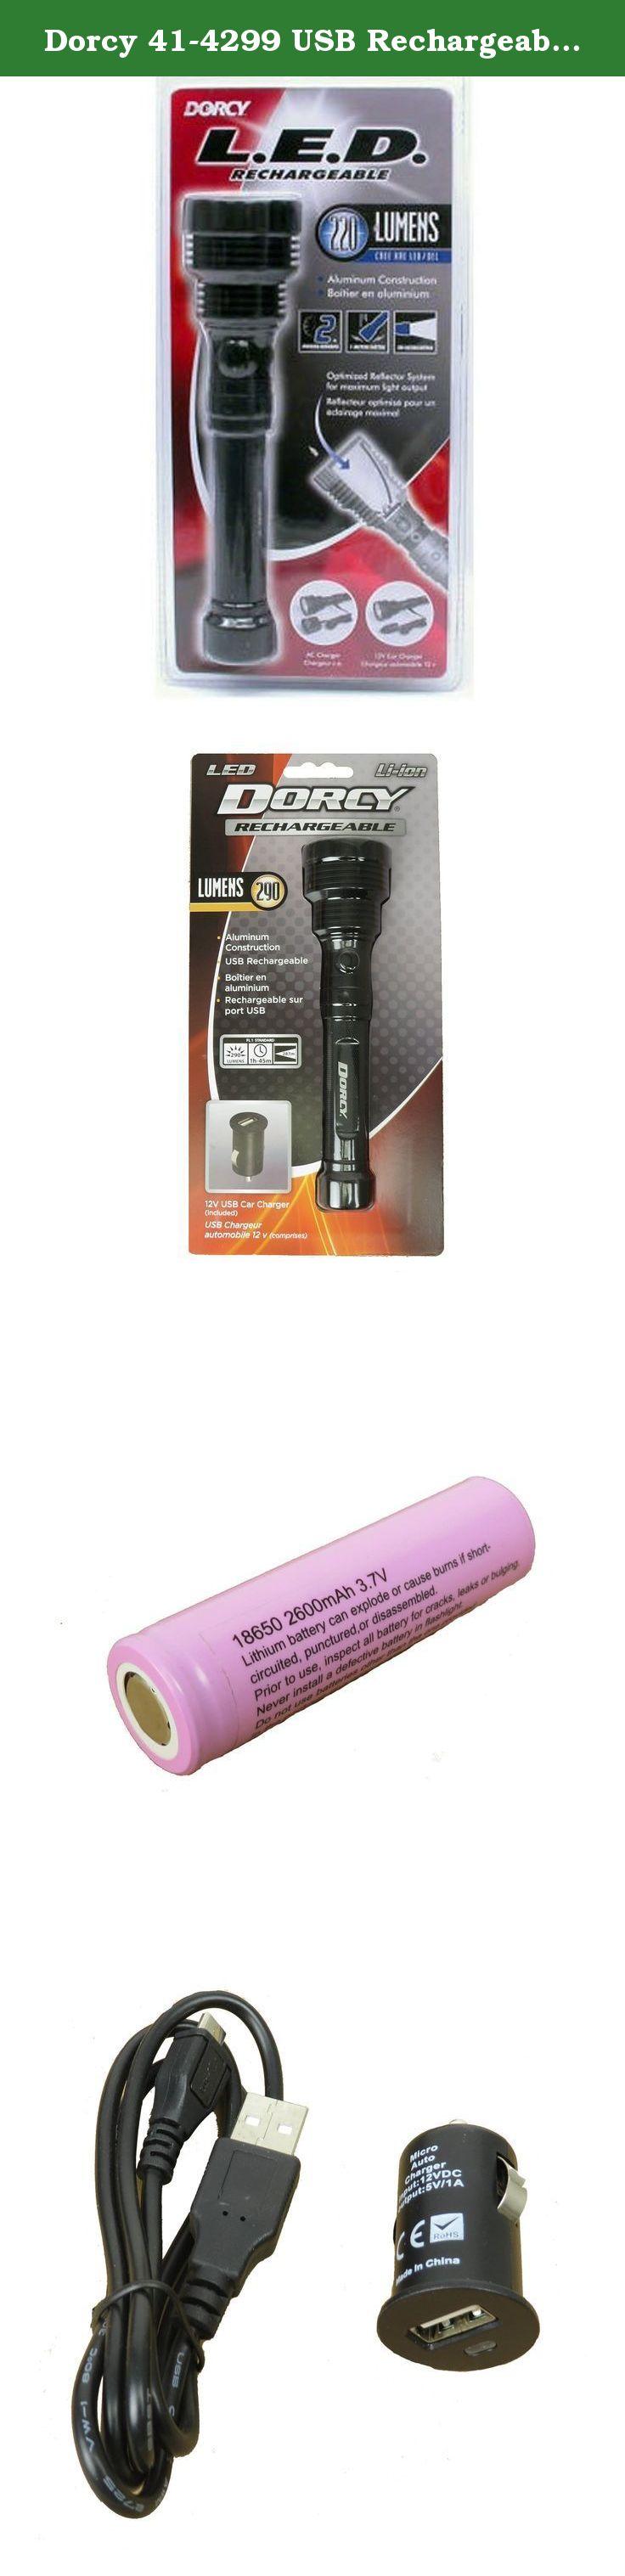 Dorcy 41-4299 USB Rechargeable Aluminm LED Flashlight wi